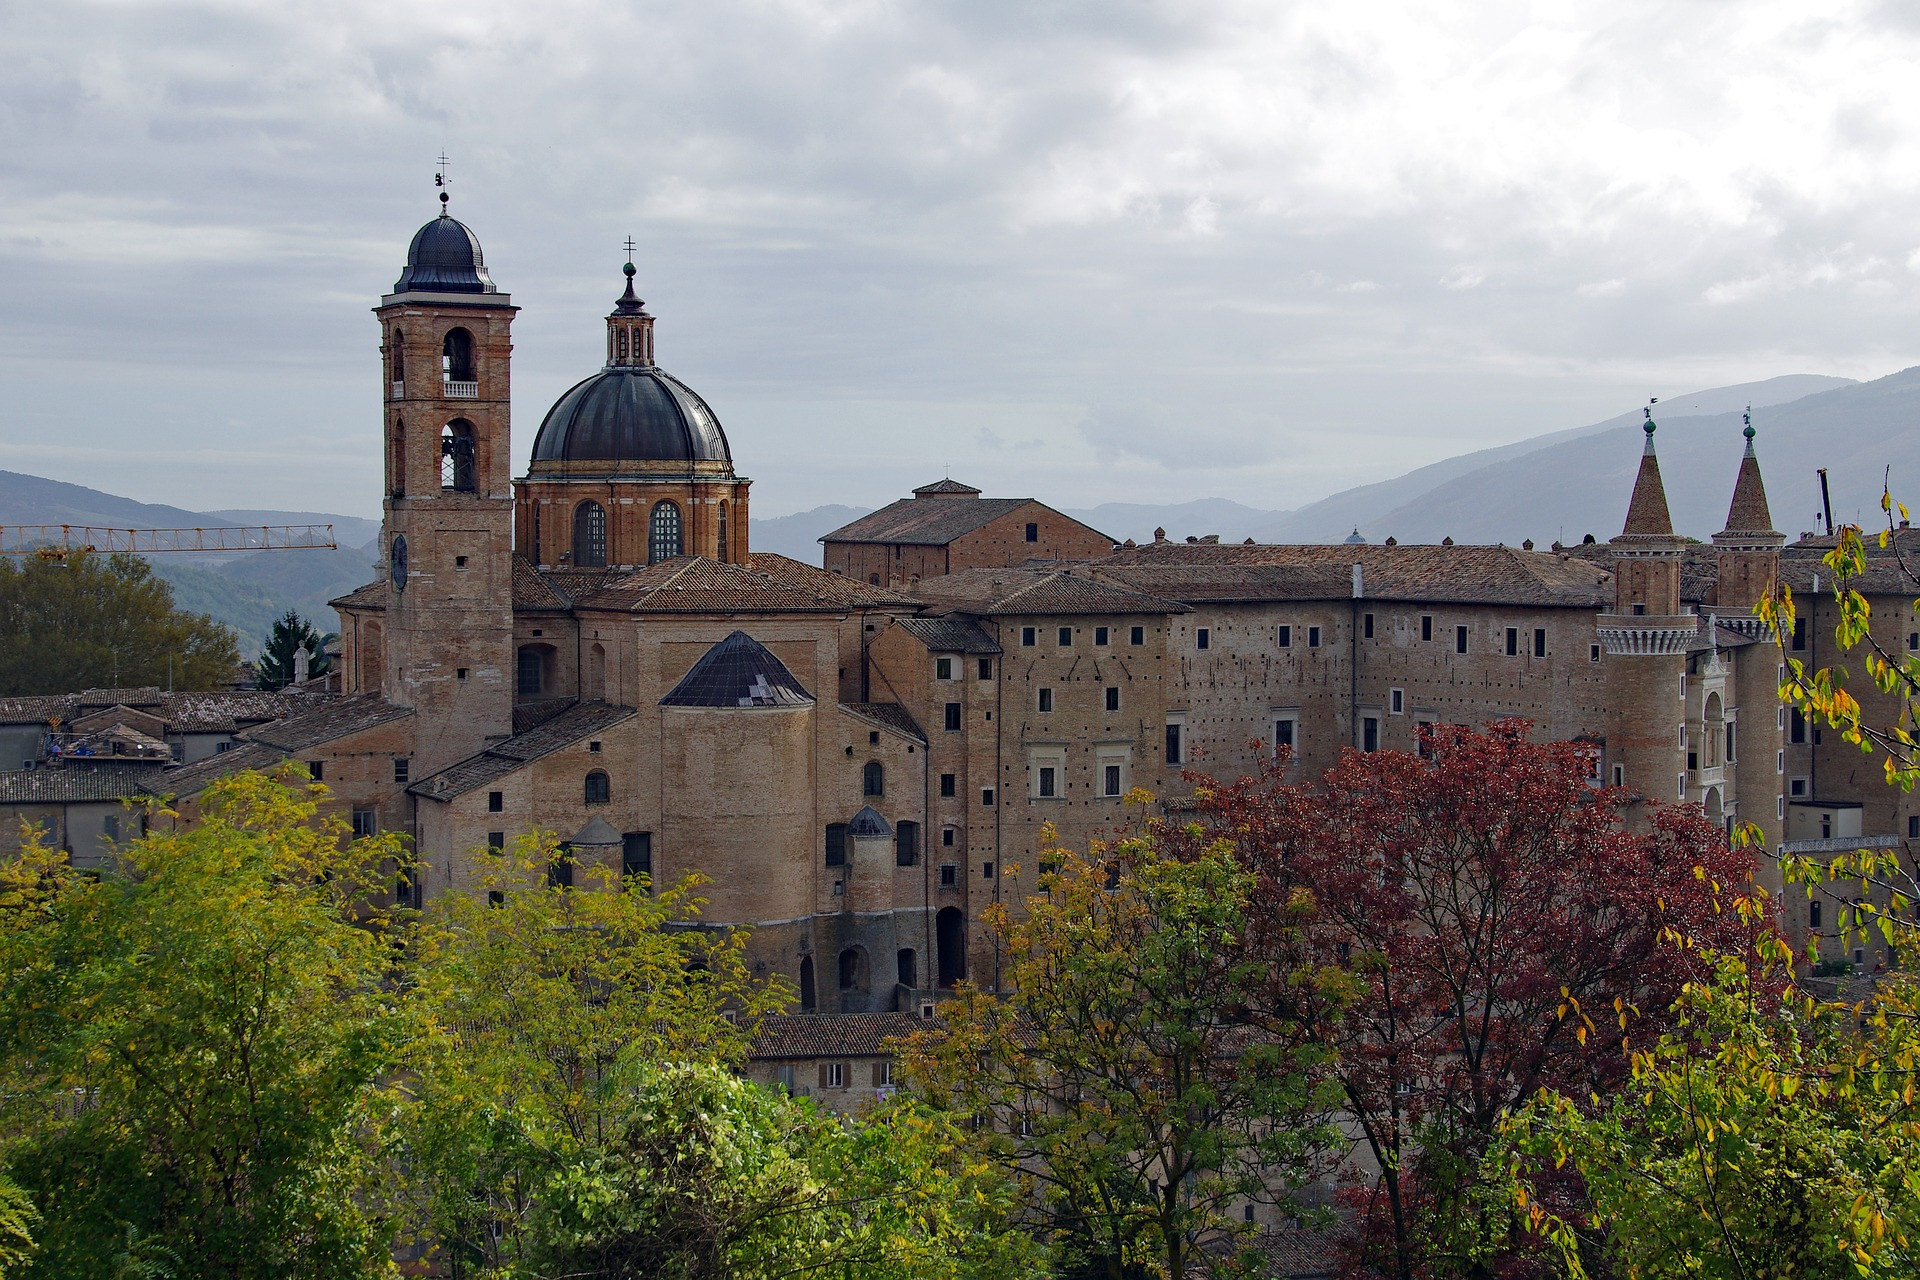 Palazzo Ducale - doen in Urbino